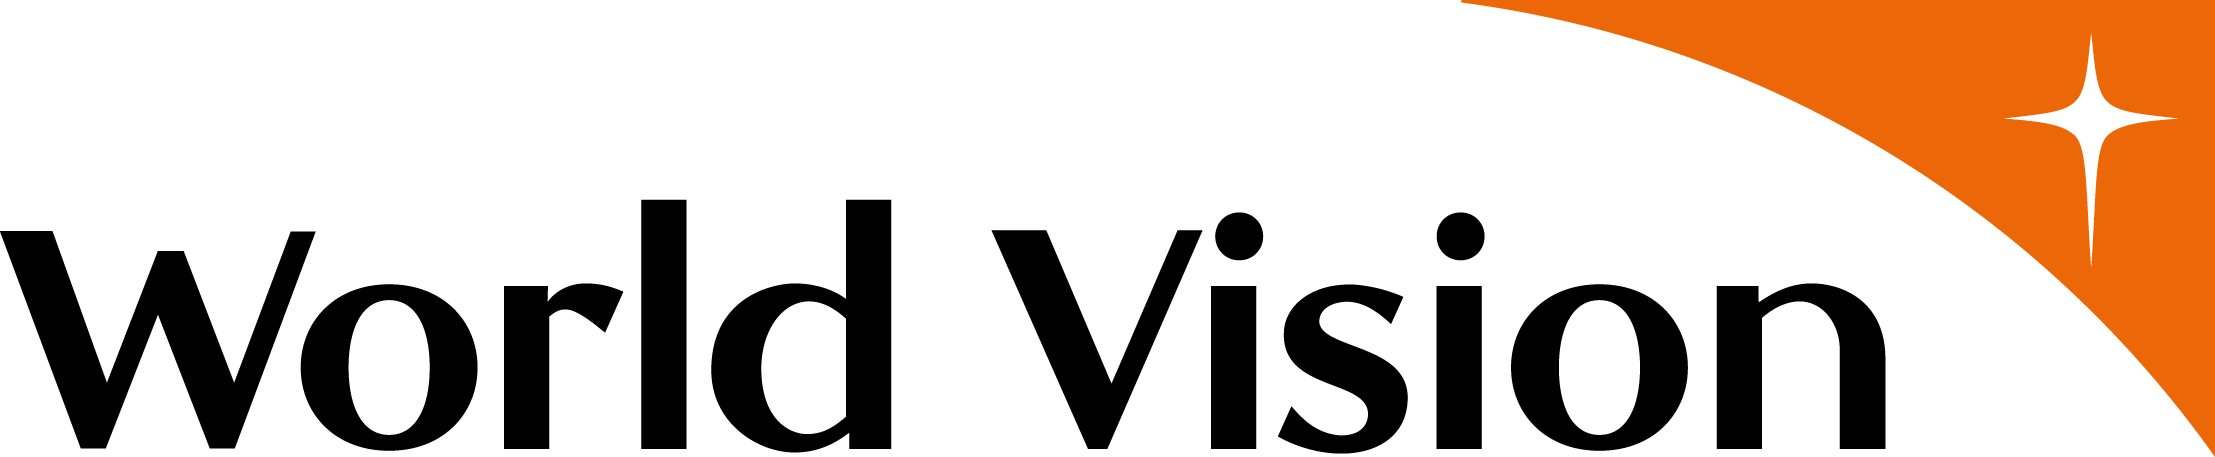 wv-logo-new-PMS1505-Quadri